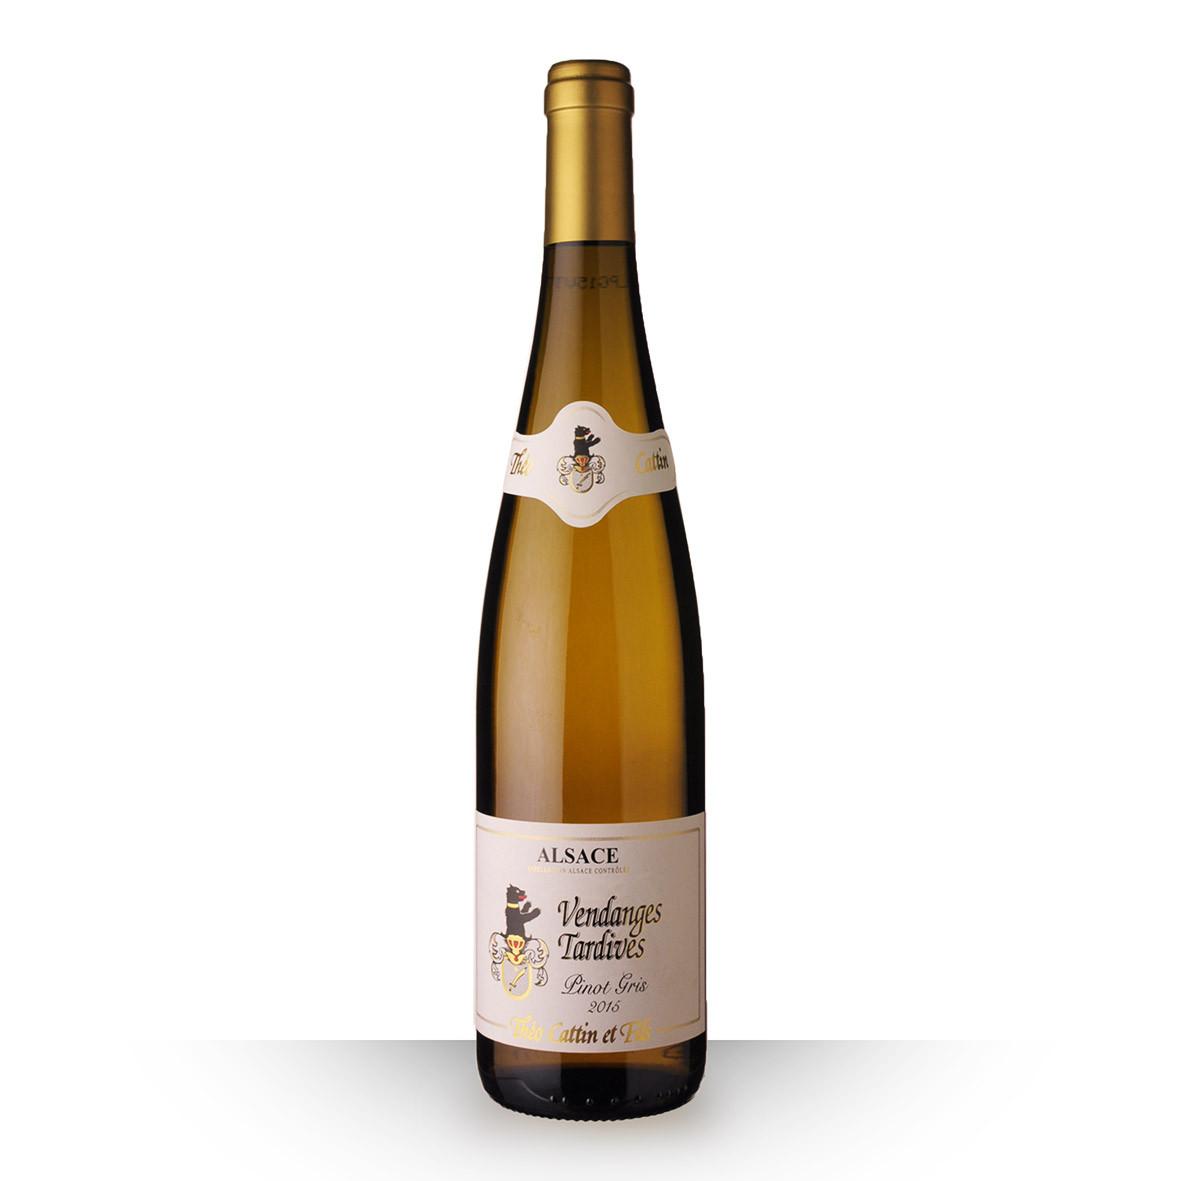 Théo Cattin Vendanges Tardives Alsace Pinot Gris Blanc 2015 75cl www.odyssee-vins.com